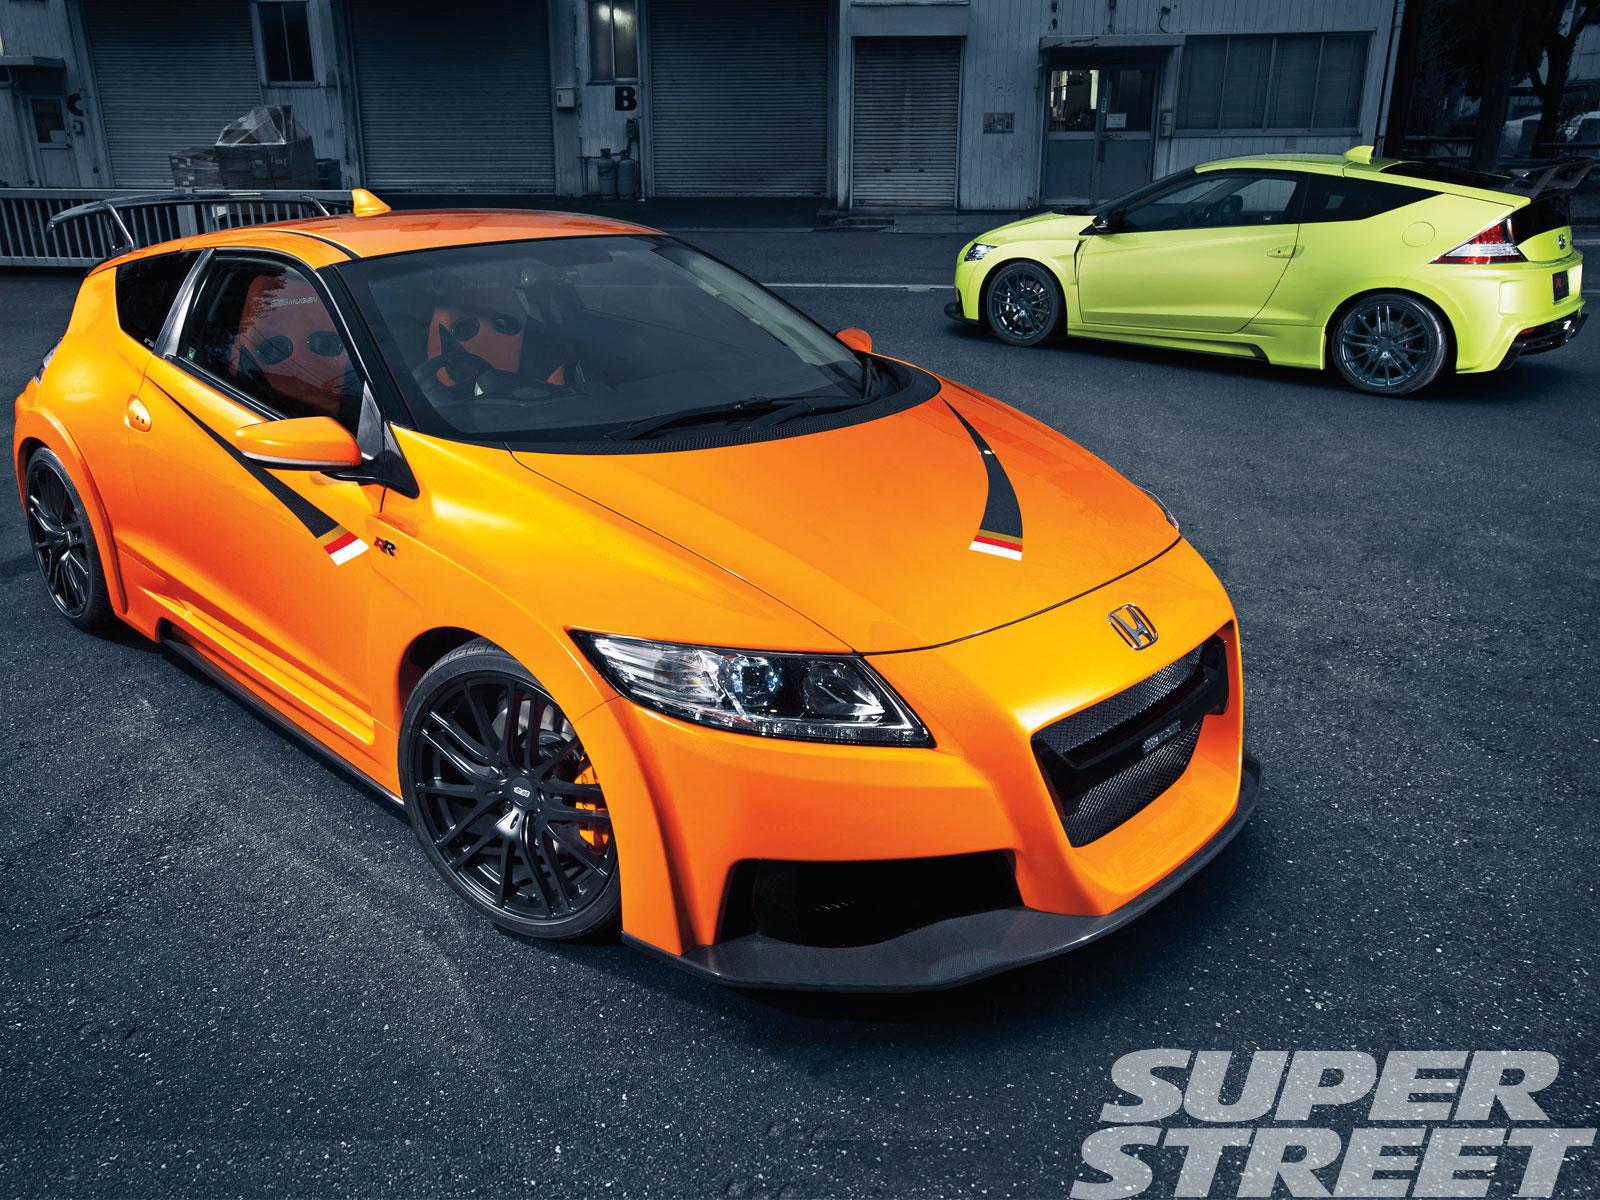 Honda Cr Z Mugen Rr Pre Production And Honda Cr Z Mugen Rr Concept Without Limits Super Street Magazine